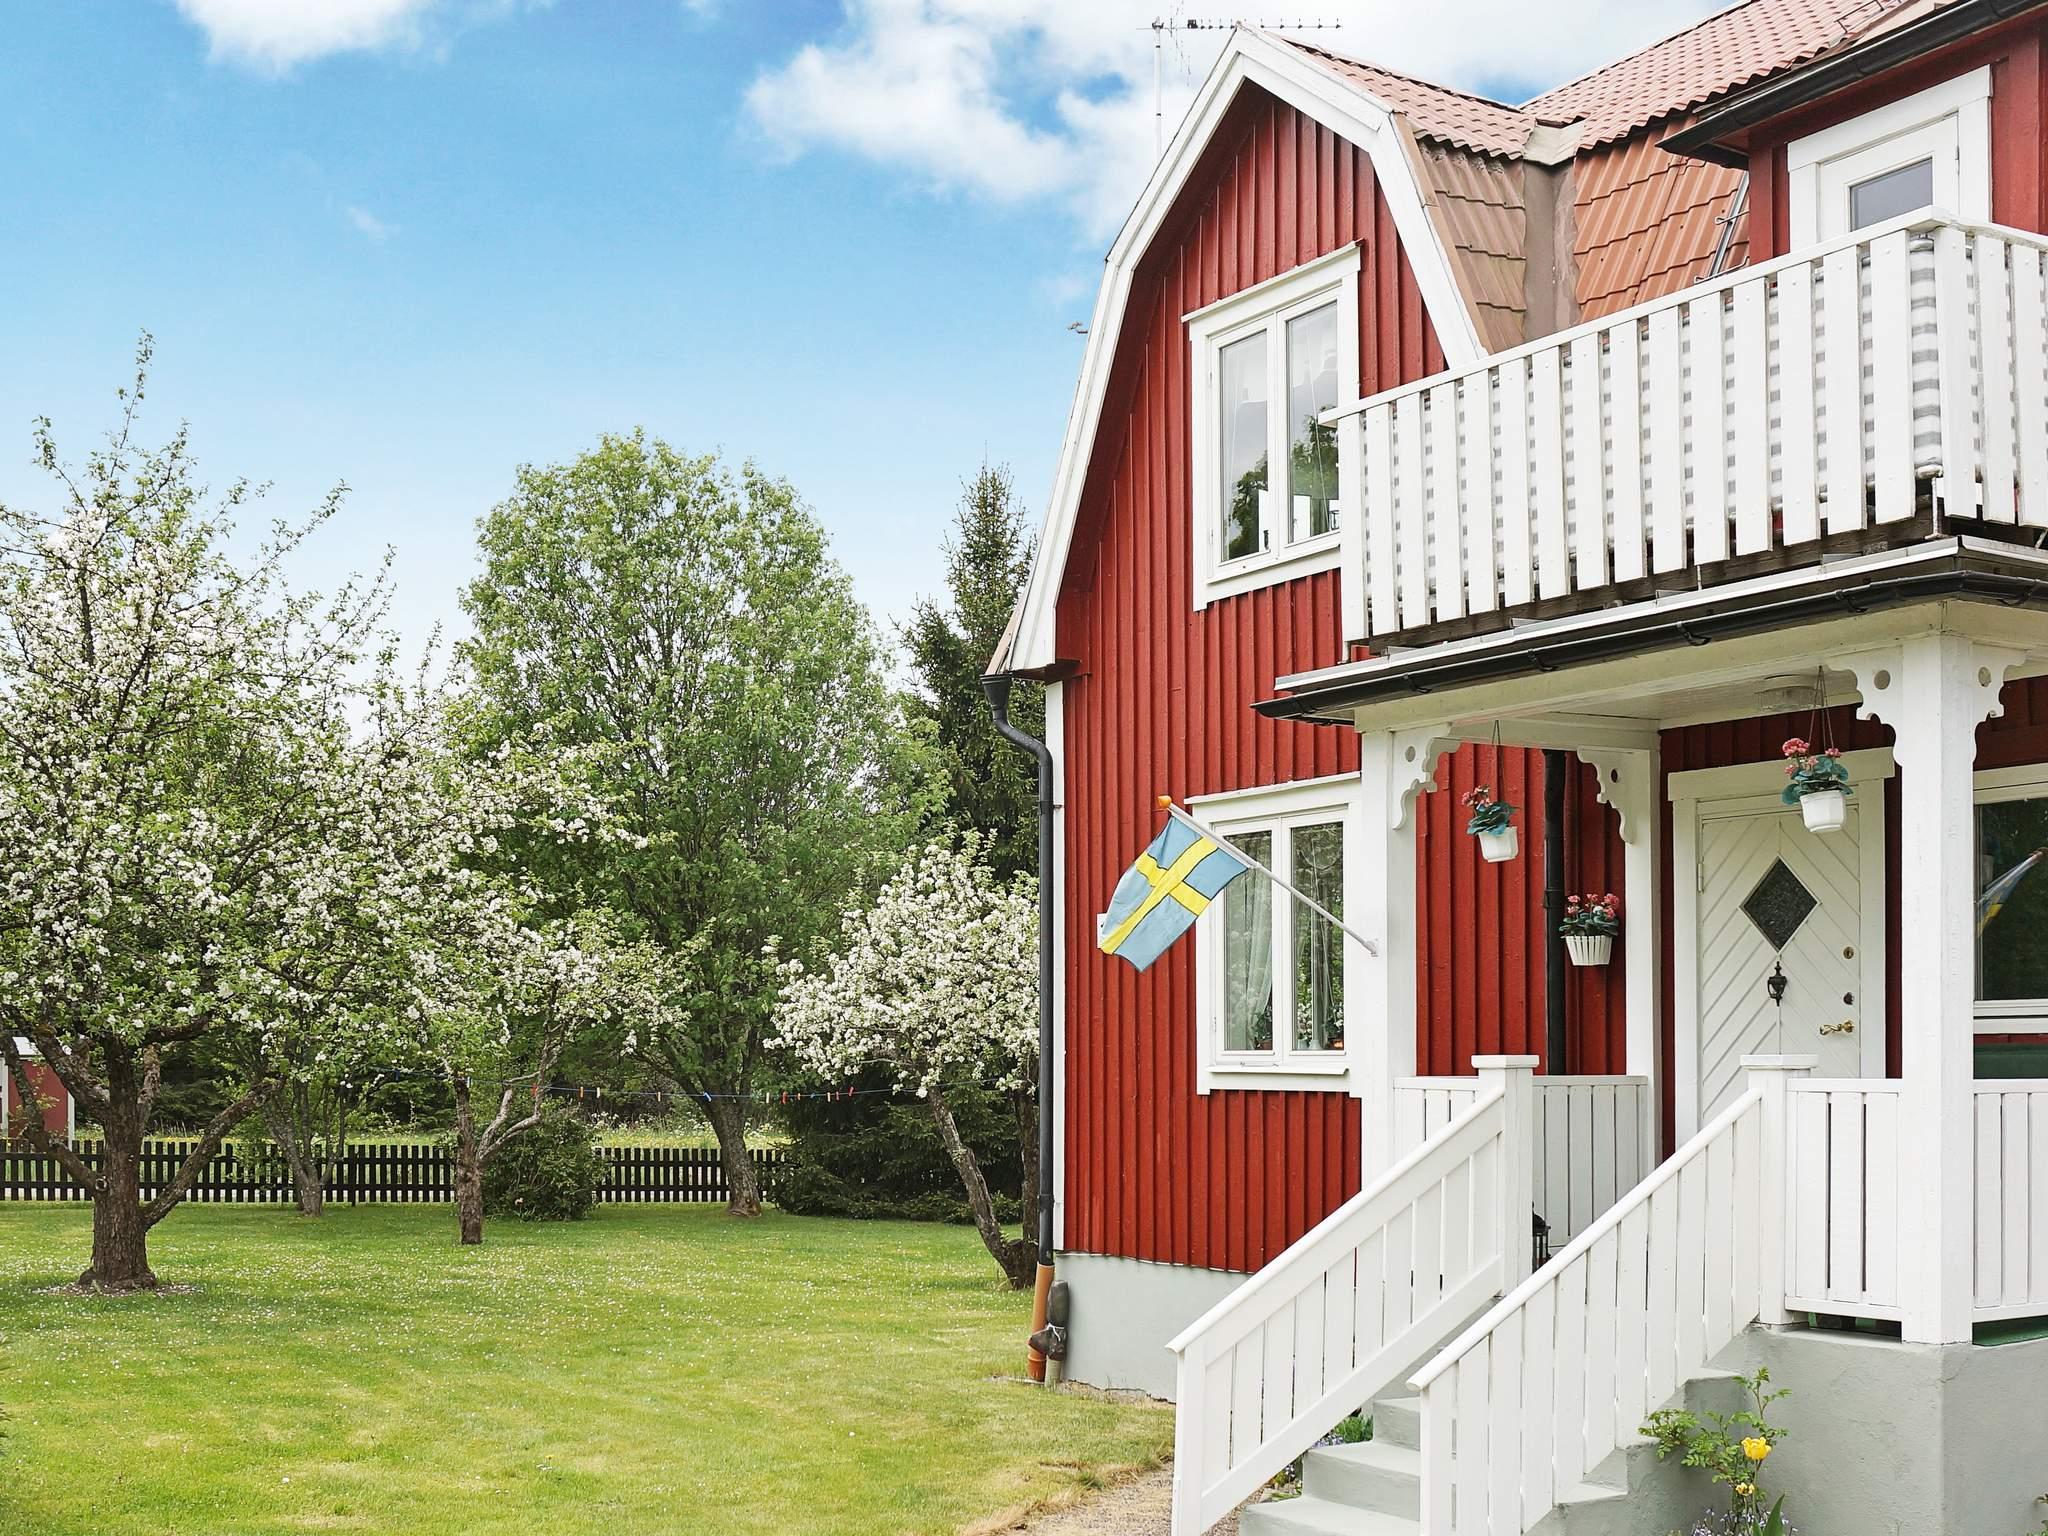 Ferienhaus Sandsjöfors (418764), Sandsjöfors, Jönköpings län, Südschweden, Schweden, Bild 21